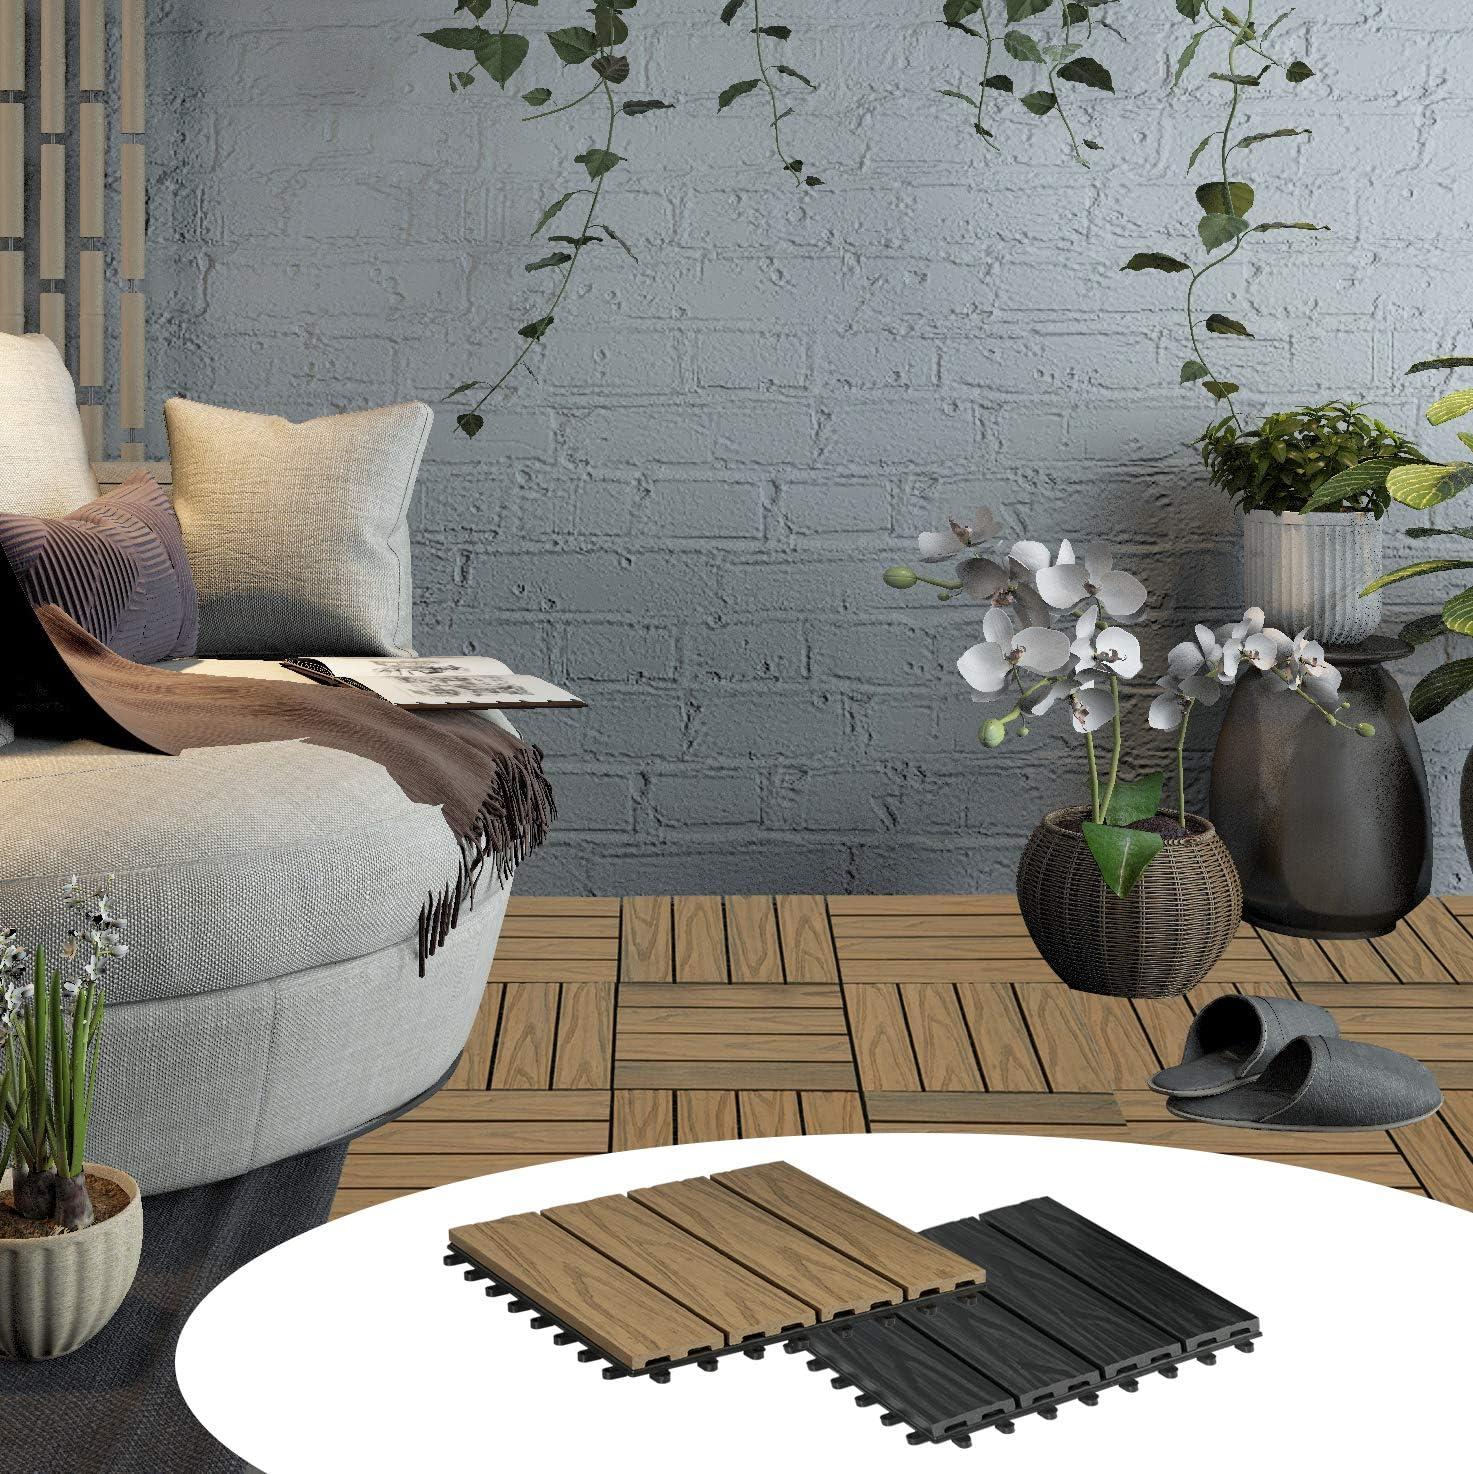 11er Set Garten Balkon Bodenbelag Terrassenfliesen Klickfliesen Zuschneidbar mit Stecksystem WPC Fliesen Klickfliese 3D Holzstruktur 1m/² Hellbraun Kinderleicht zu verlegen